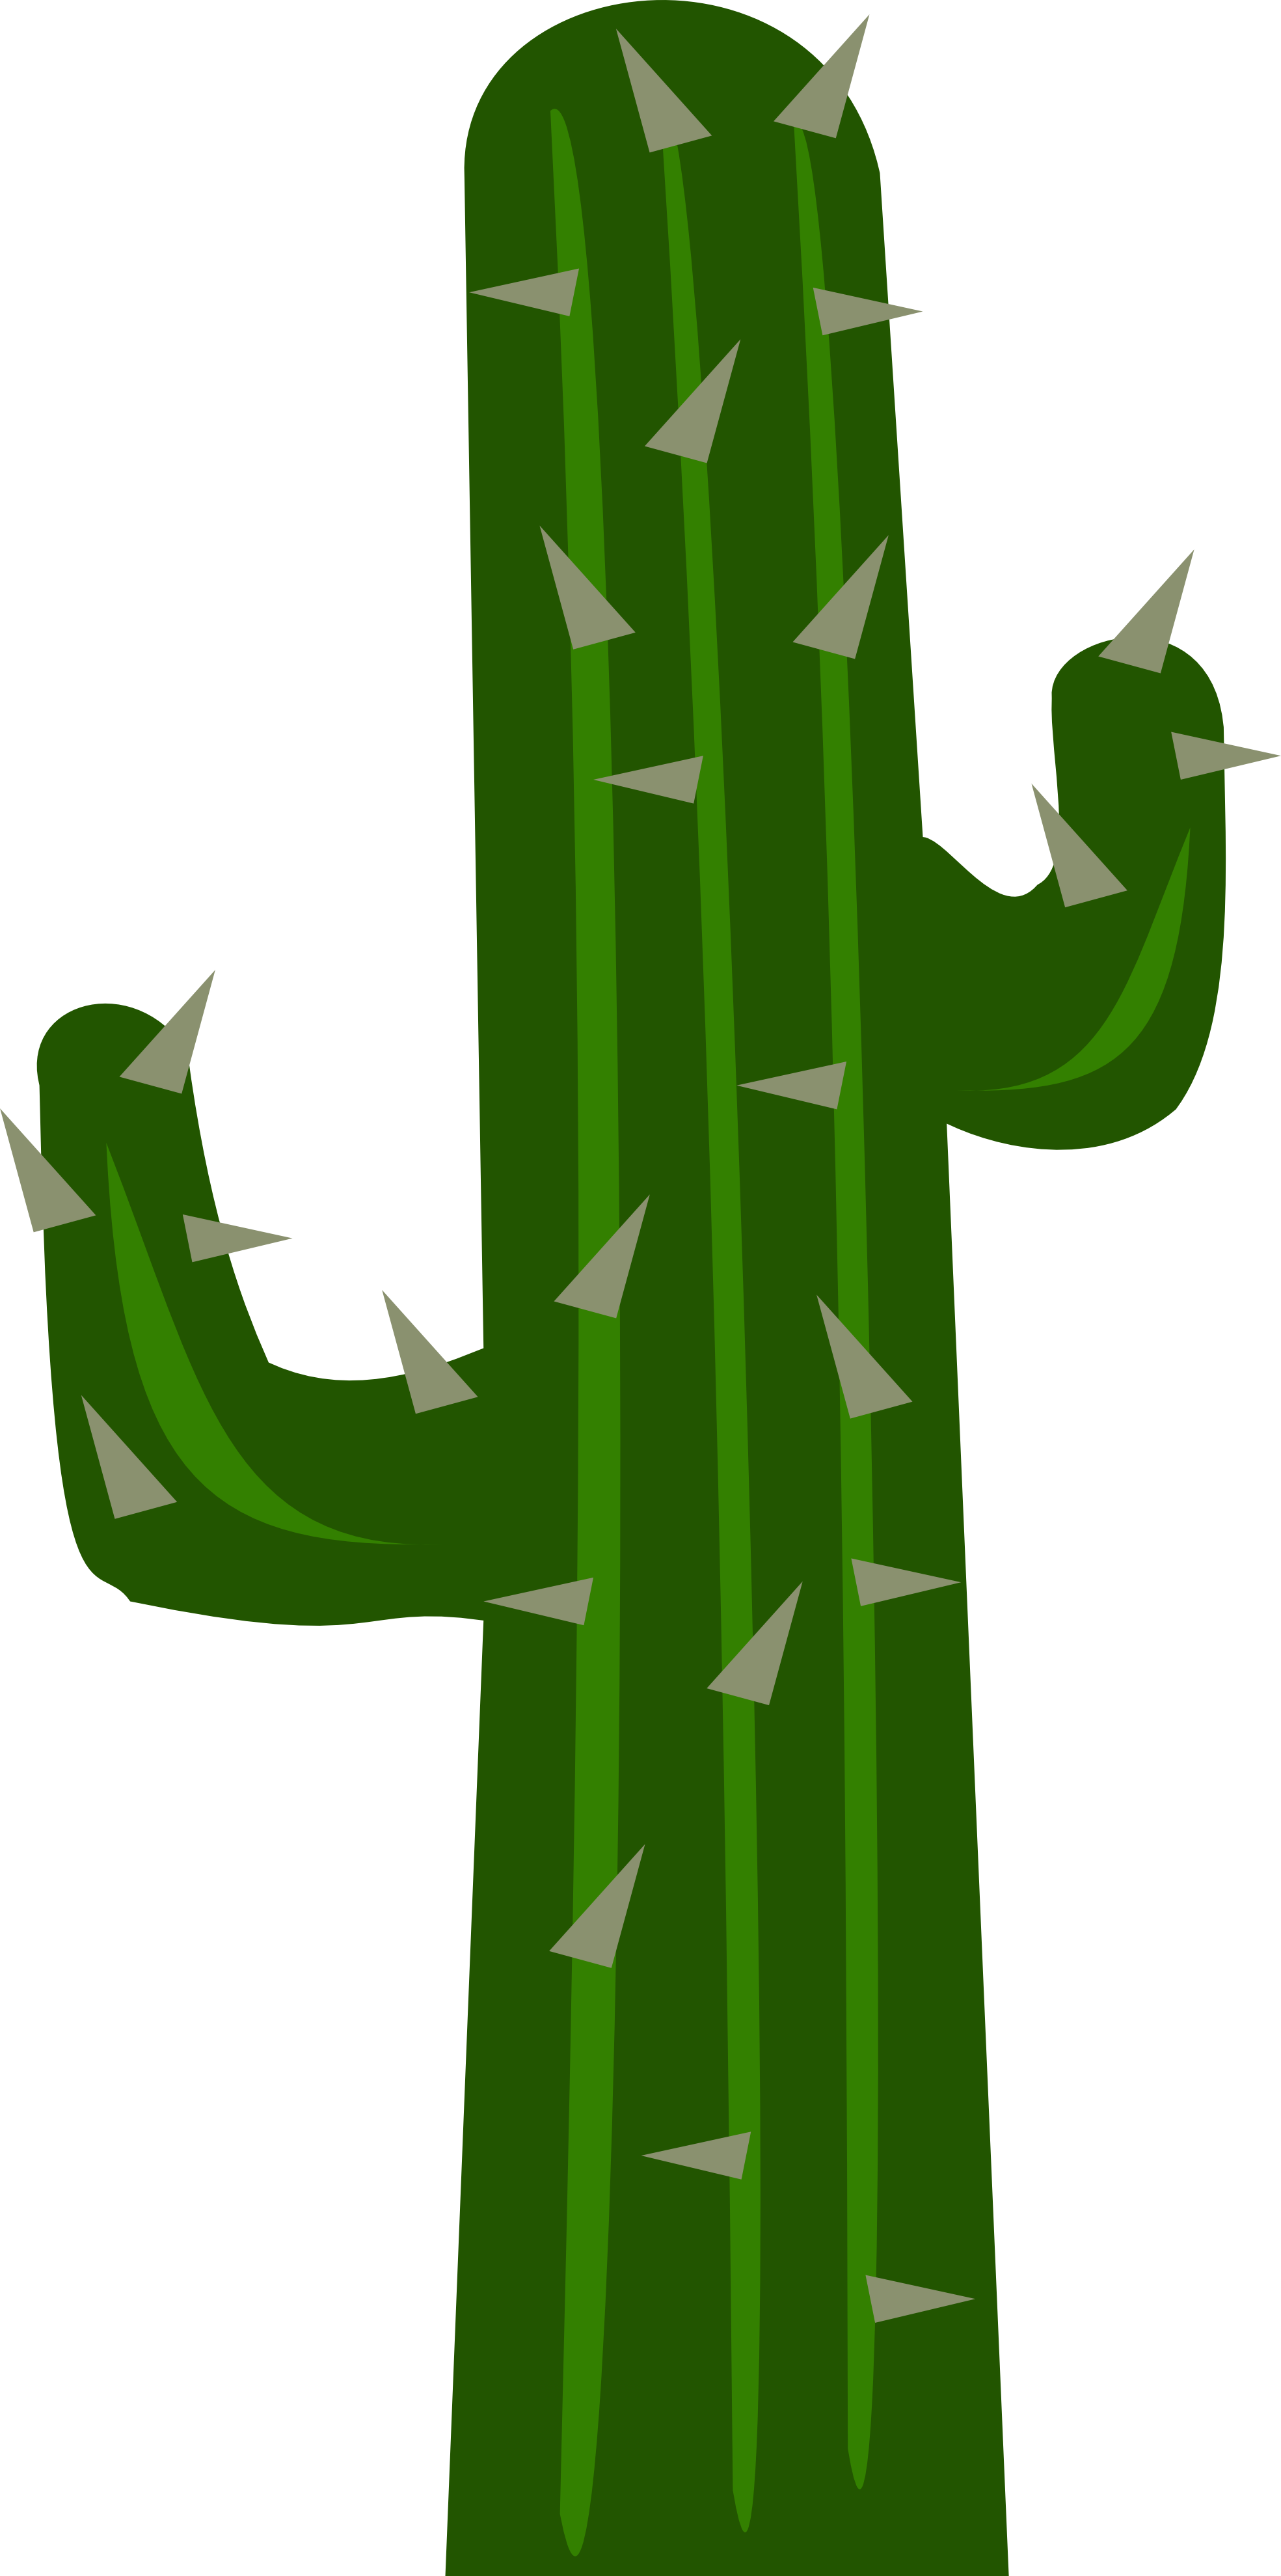 Background clipart cactus #5